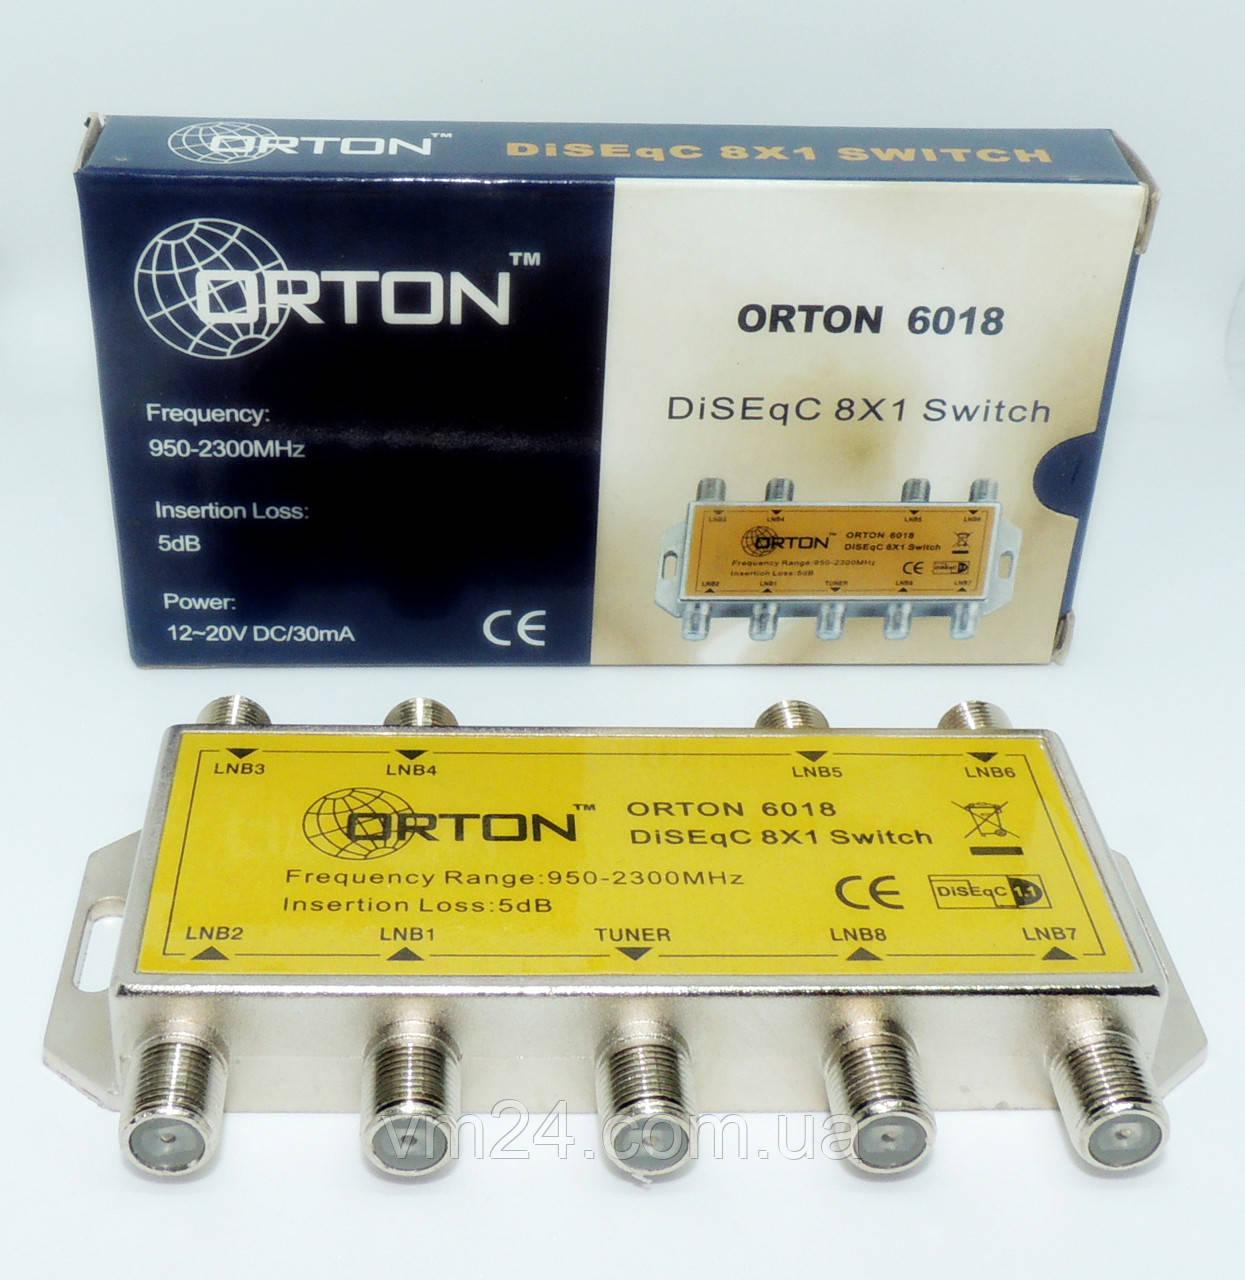 Коммутатор DiSEqC 1.1 Orton DSG 8/1 Diseq 8x1